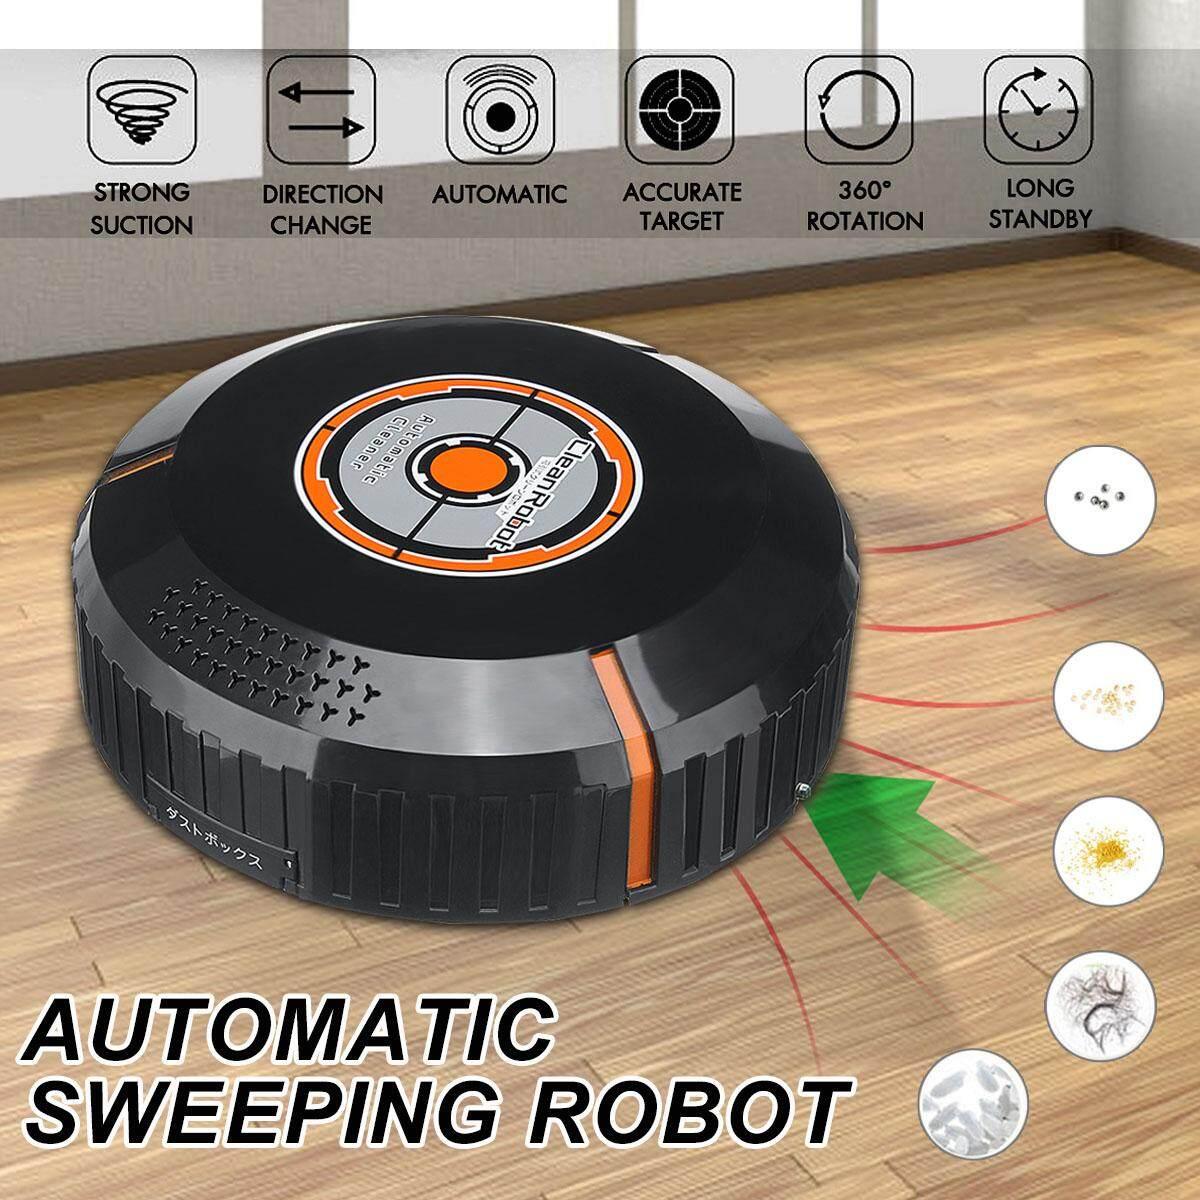 Automatic USB ชาร์จสมาร์ทกวาดเครื่องดูดฝุ่นหุ่นยนต์ดูดใหม่